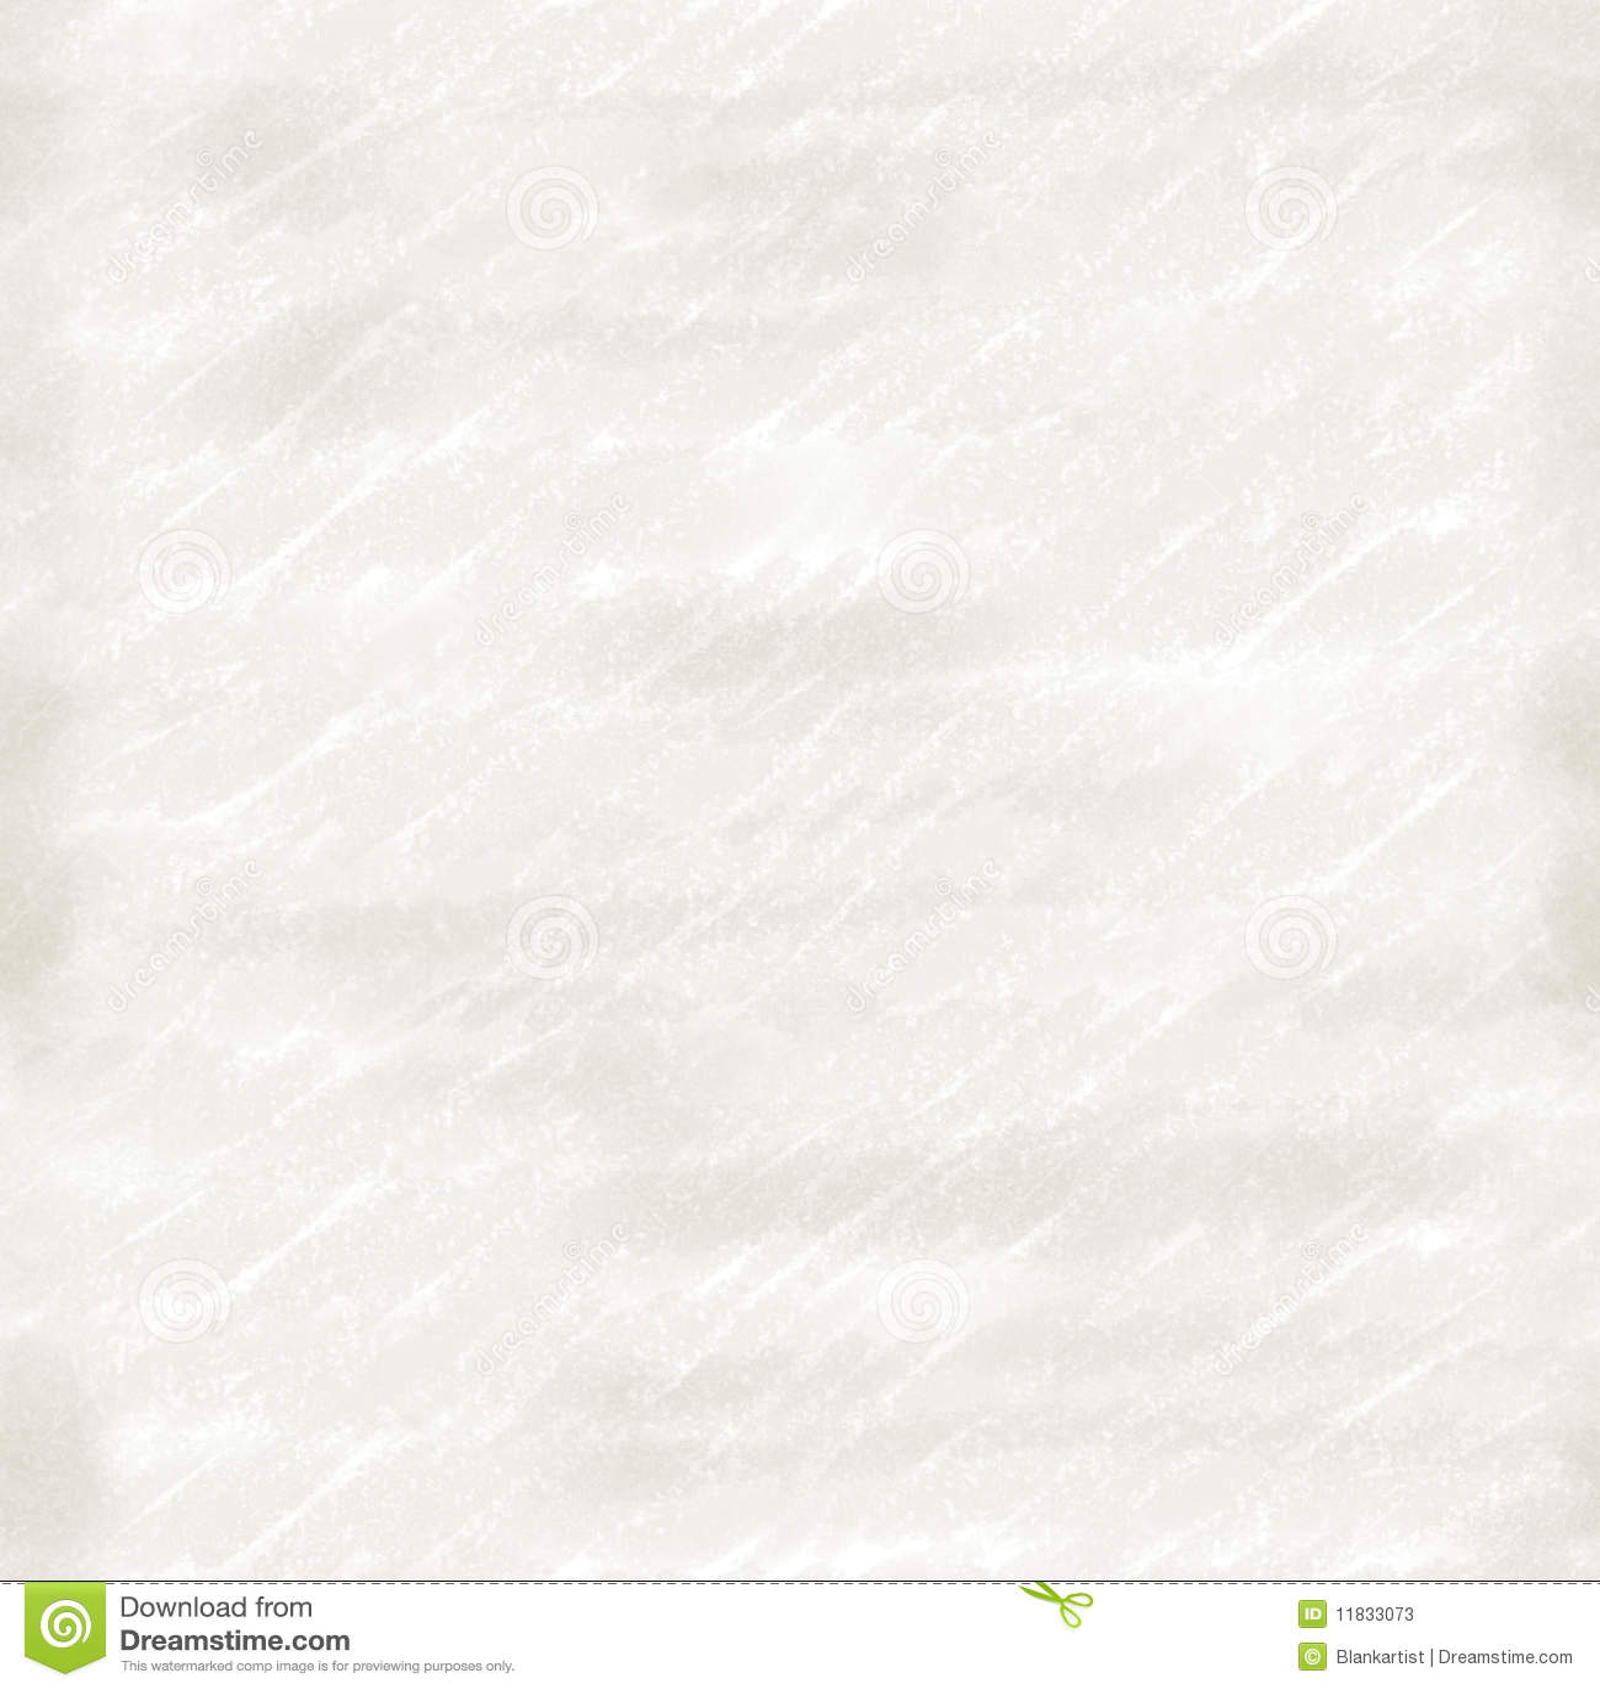 Light Gray Tile With Texture : Light gray pastel texture tile stock photos image